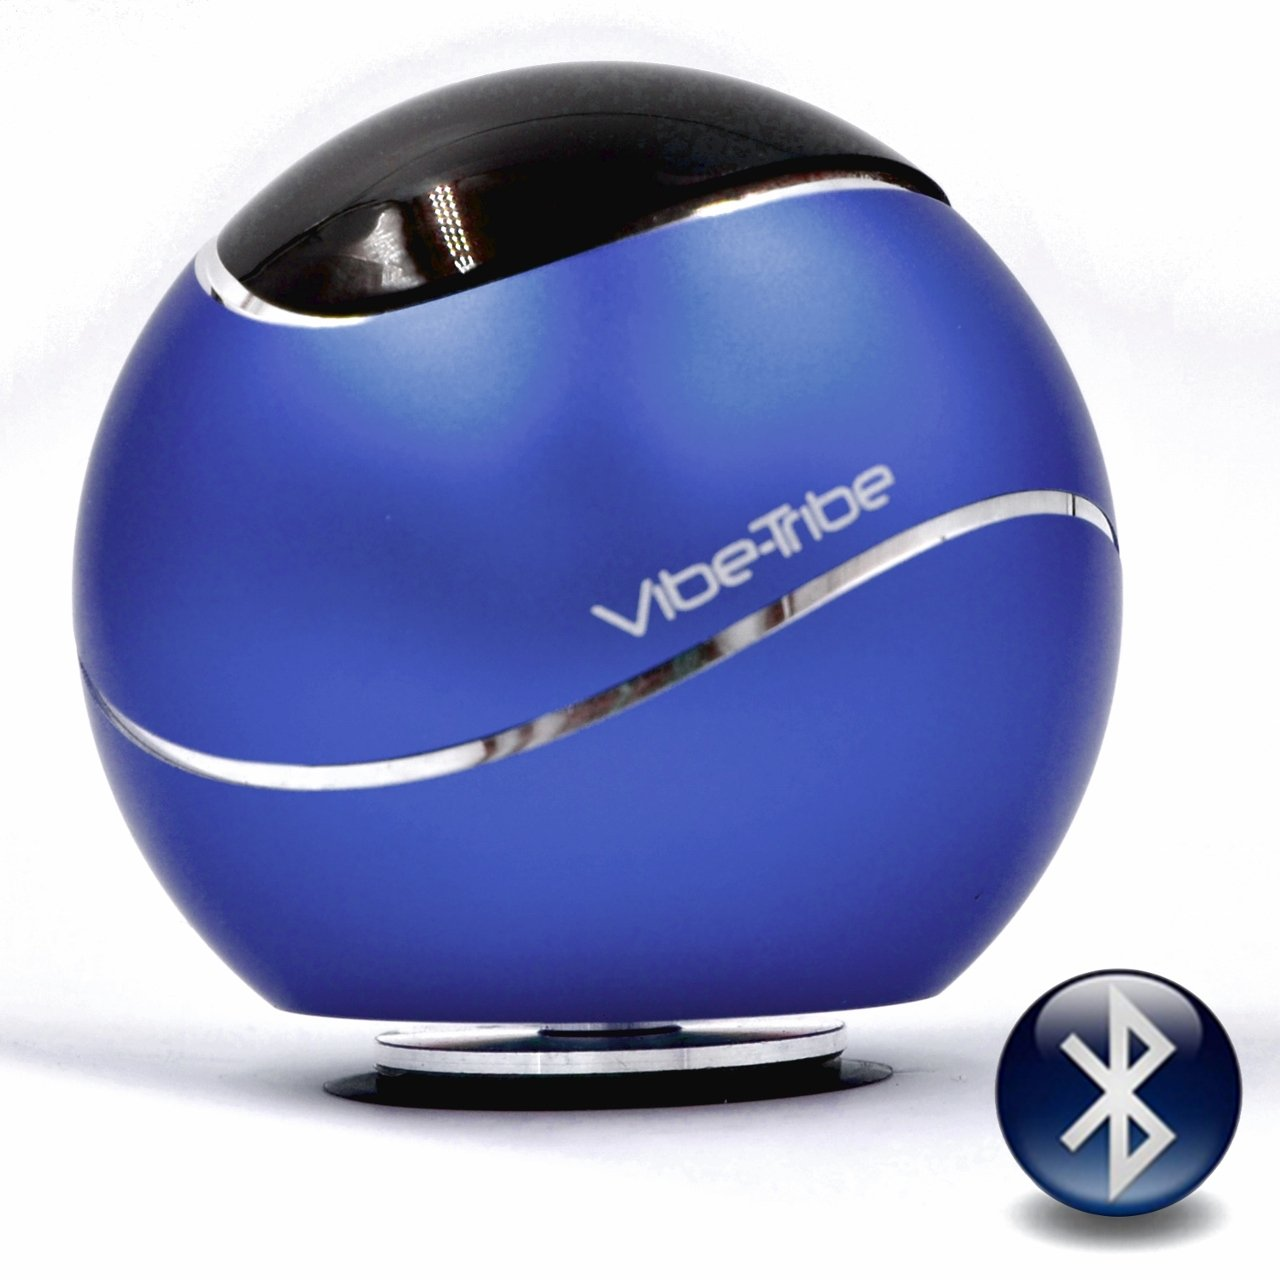 Vibe-Tribe Orbit Yale Blue: 15 Watt Bluetooth Vibration Speaker with Hands Free